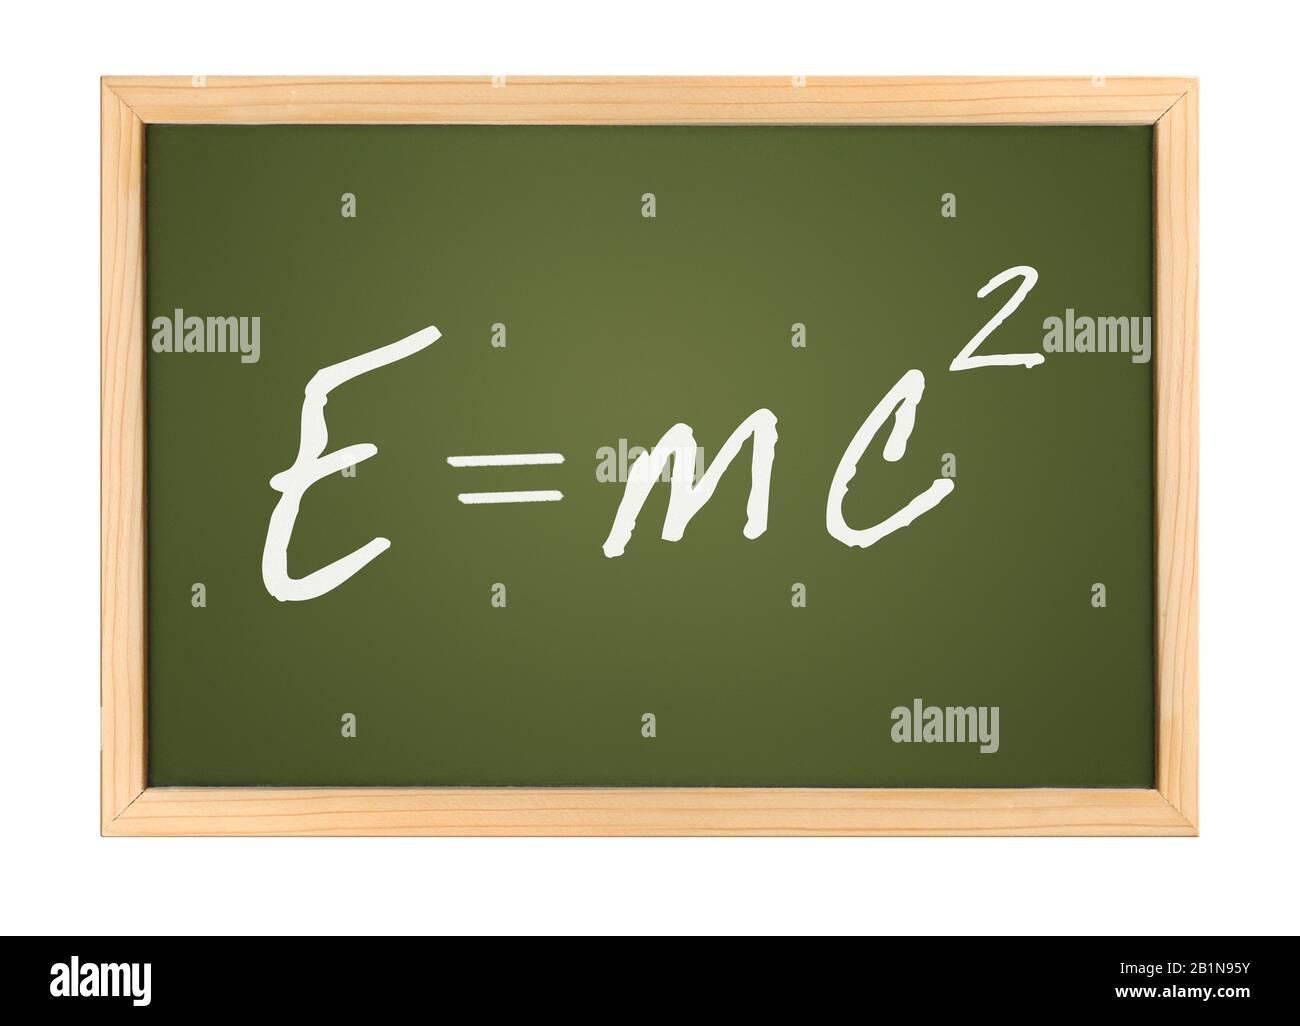 Grüner Blackboard-Schriftzug E=MC2 (Mass-Energy Equivalence) vor weißem Hintergrund Stockfoto